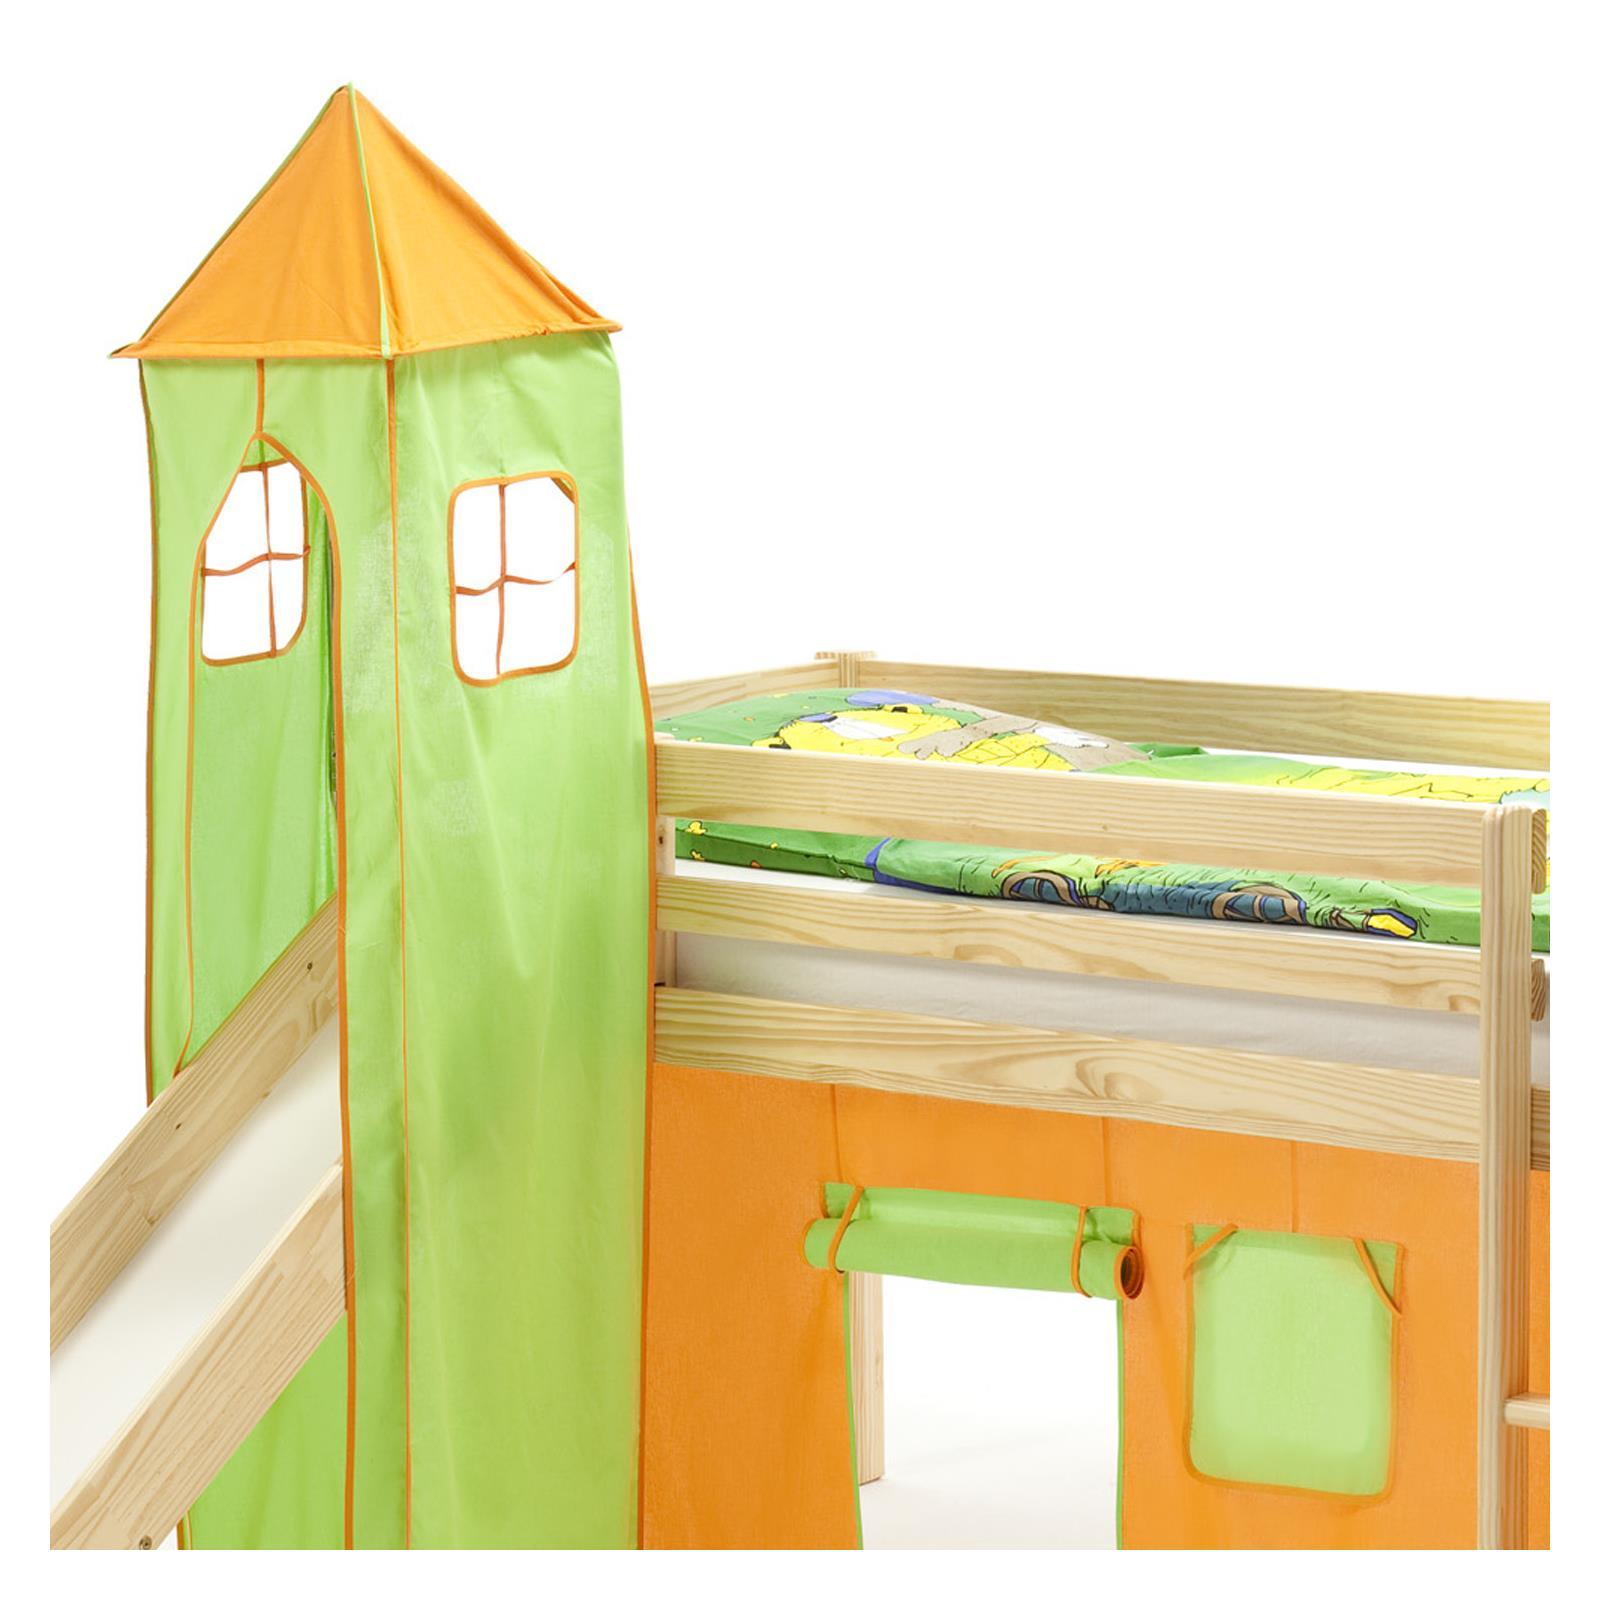 turm max zu bett mit rutsche gr n orange mobilia24. Black Bedroom Furniture Sets. Home Design Ideas